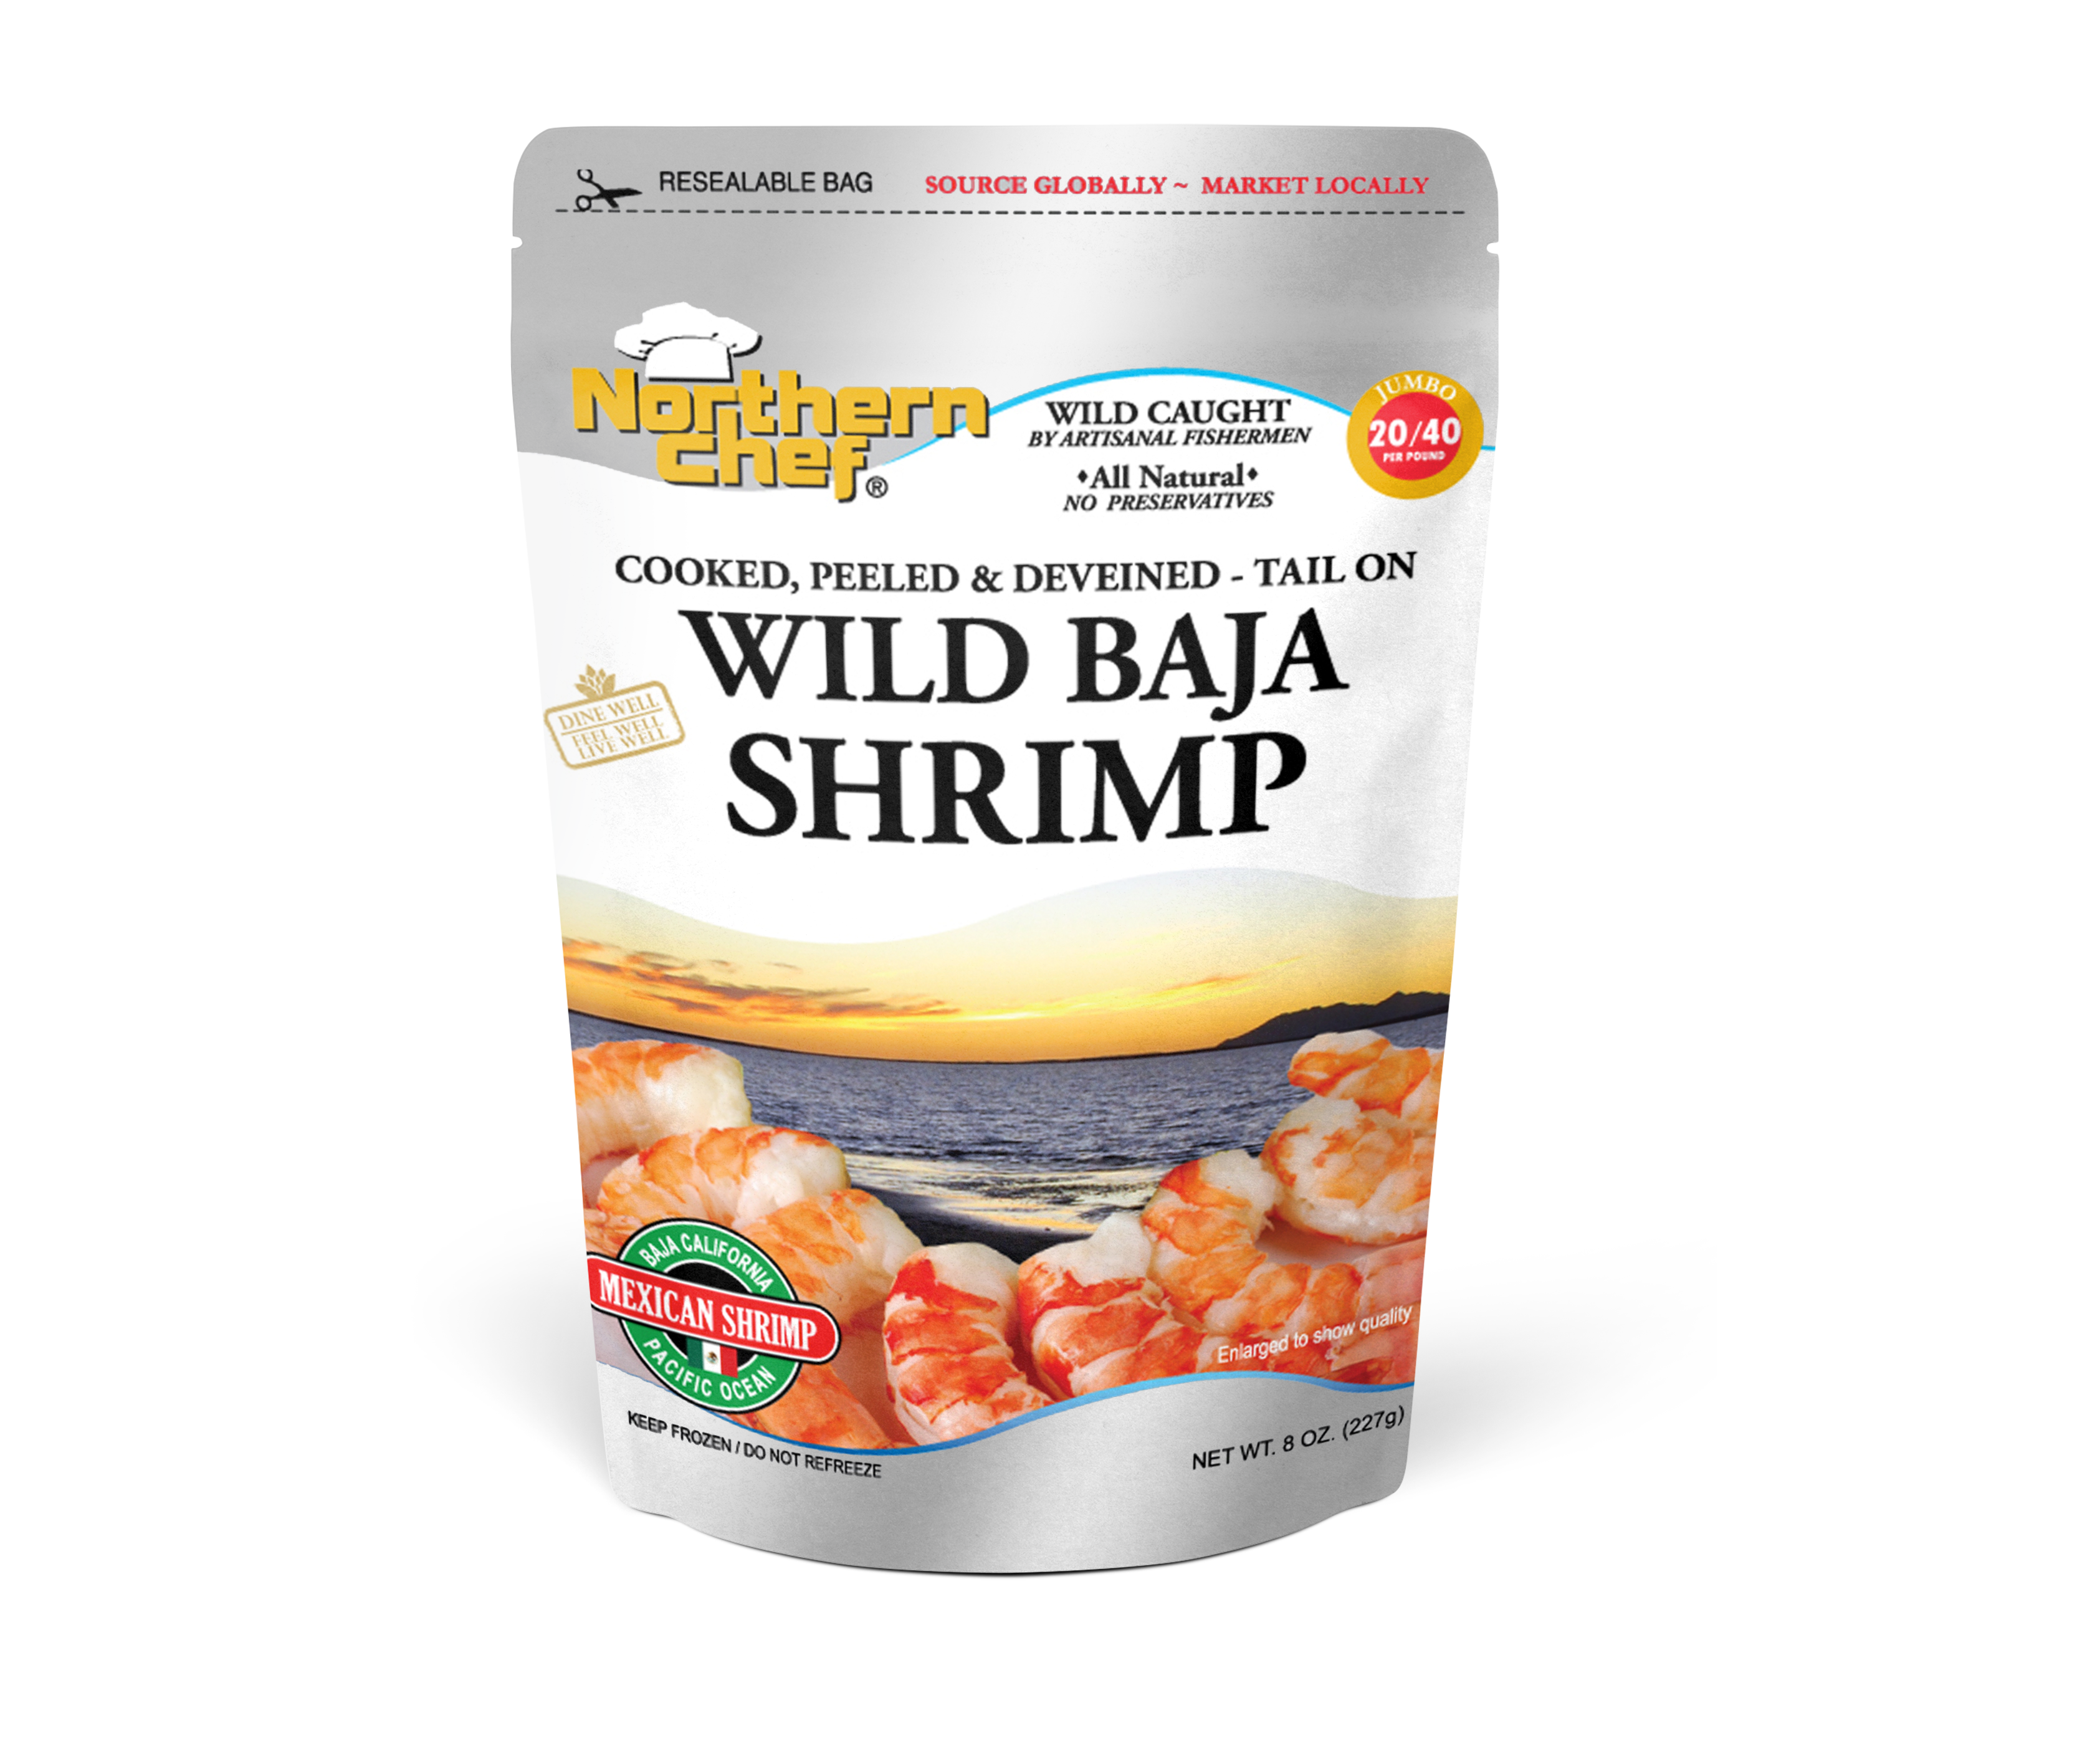 Bag - Wild Baja shrimp - 20-40